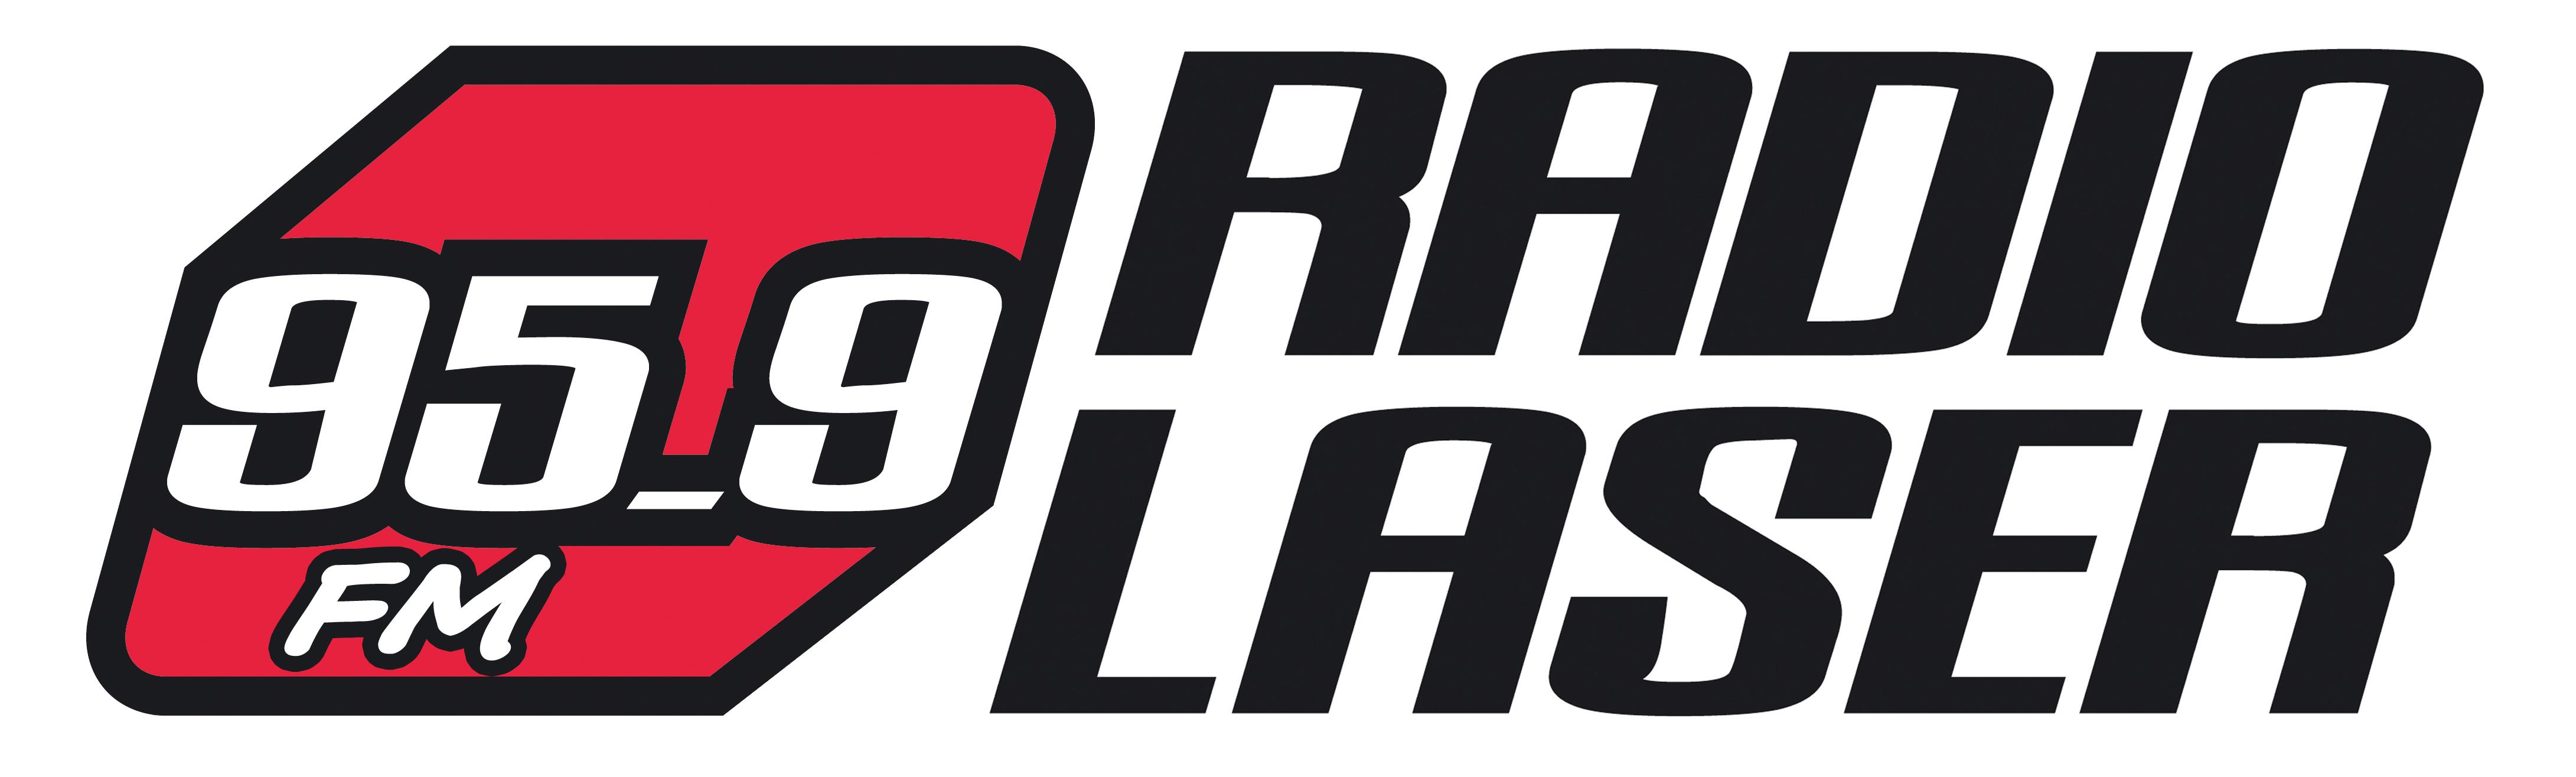 LogoHD-RadioLaser-2011